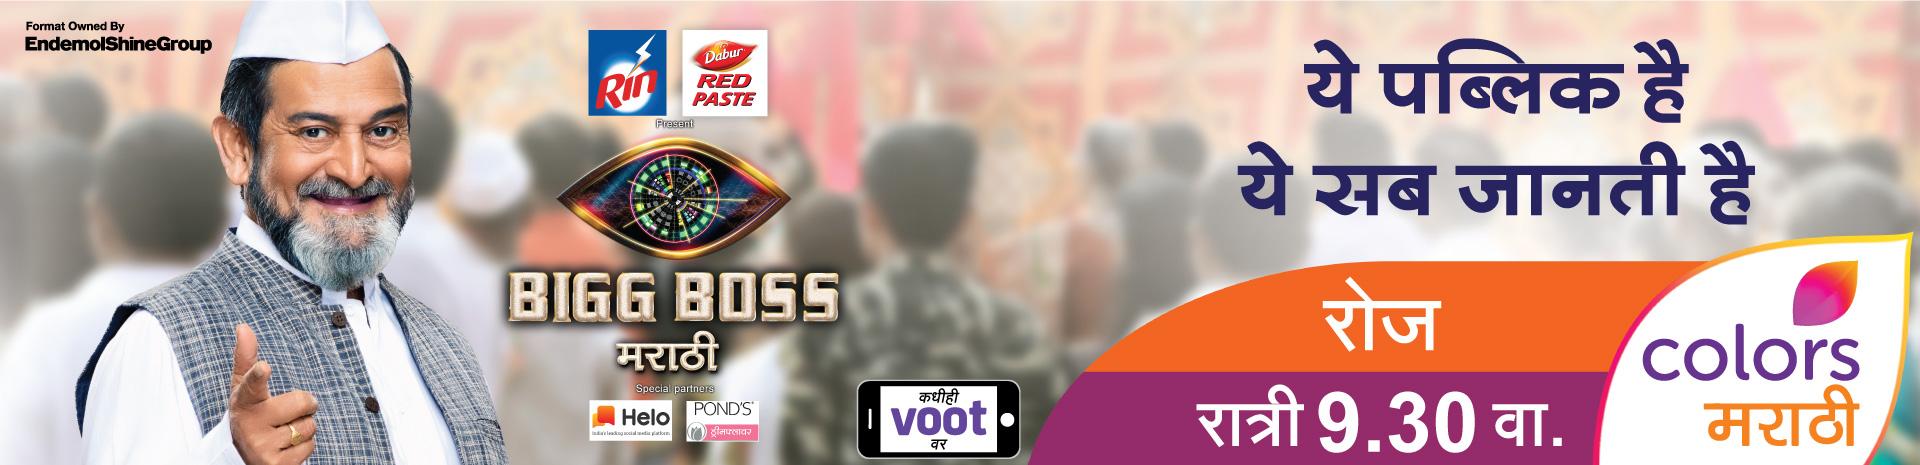 Bigg Boss Marathi Season 2 | COLORS MARATHI